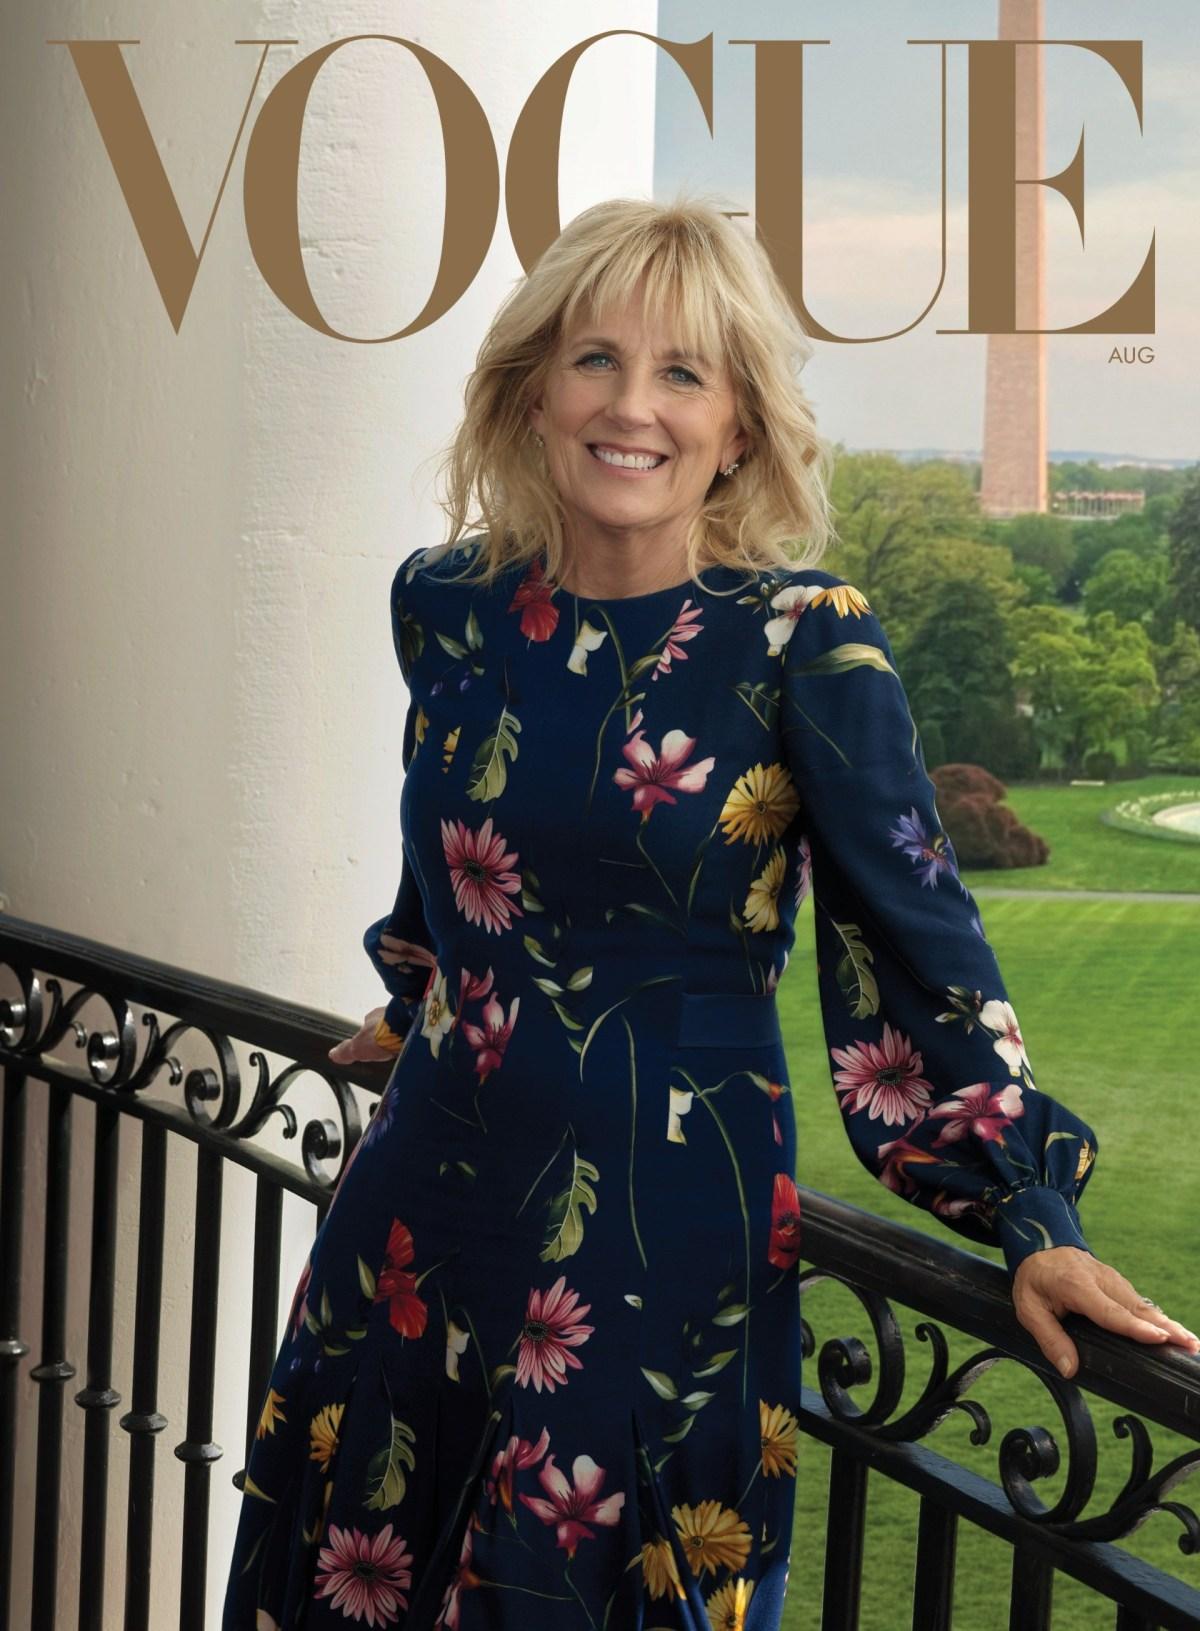 , Vogue Puts Jill Biden on August Cover After Snubbing Melania Trump, Nzuchi Times Breitbart